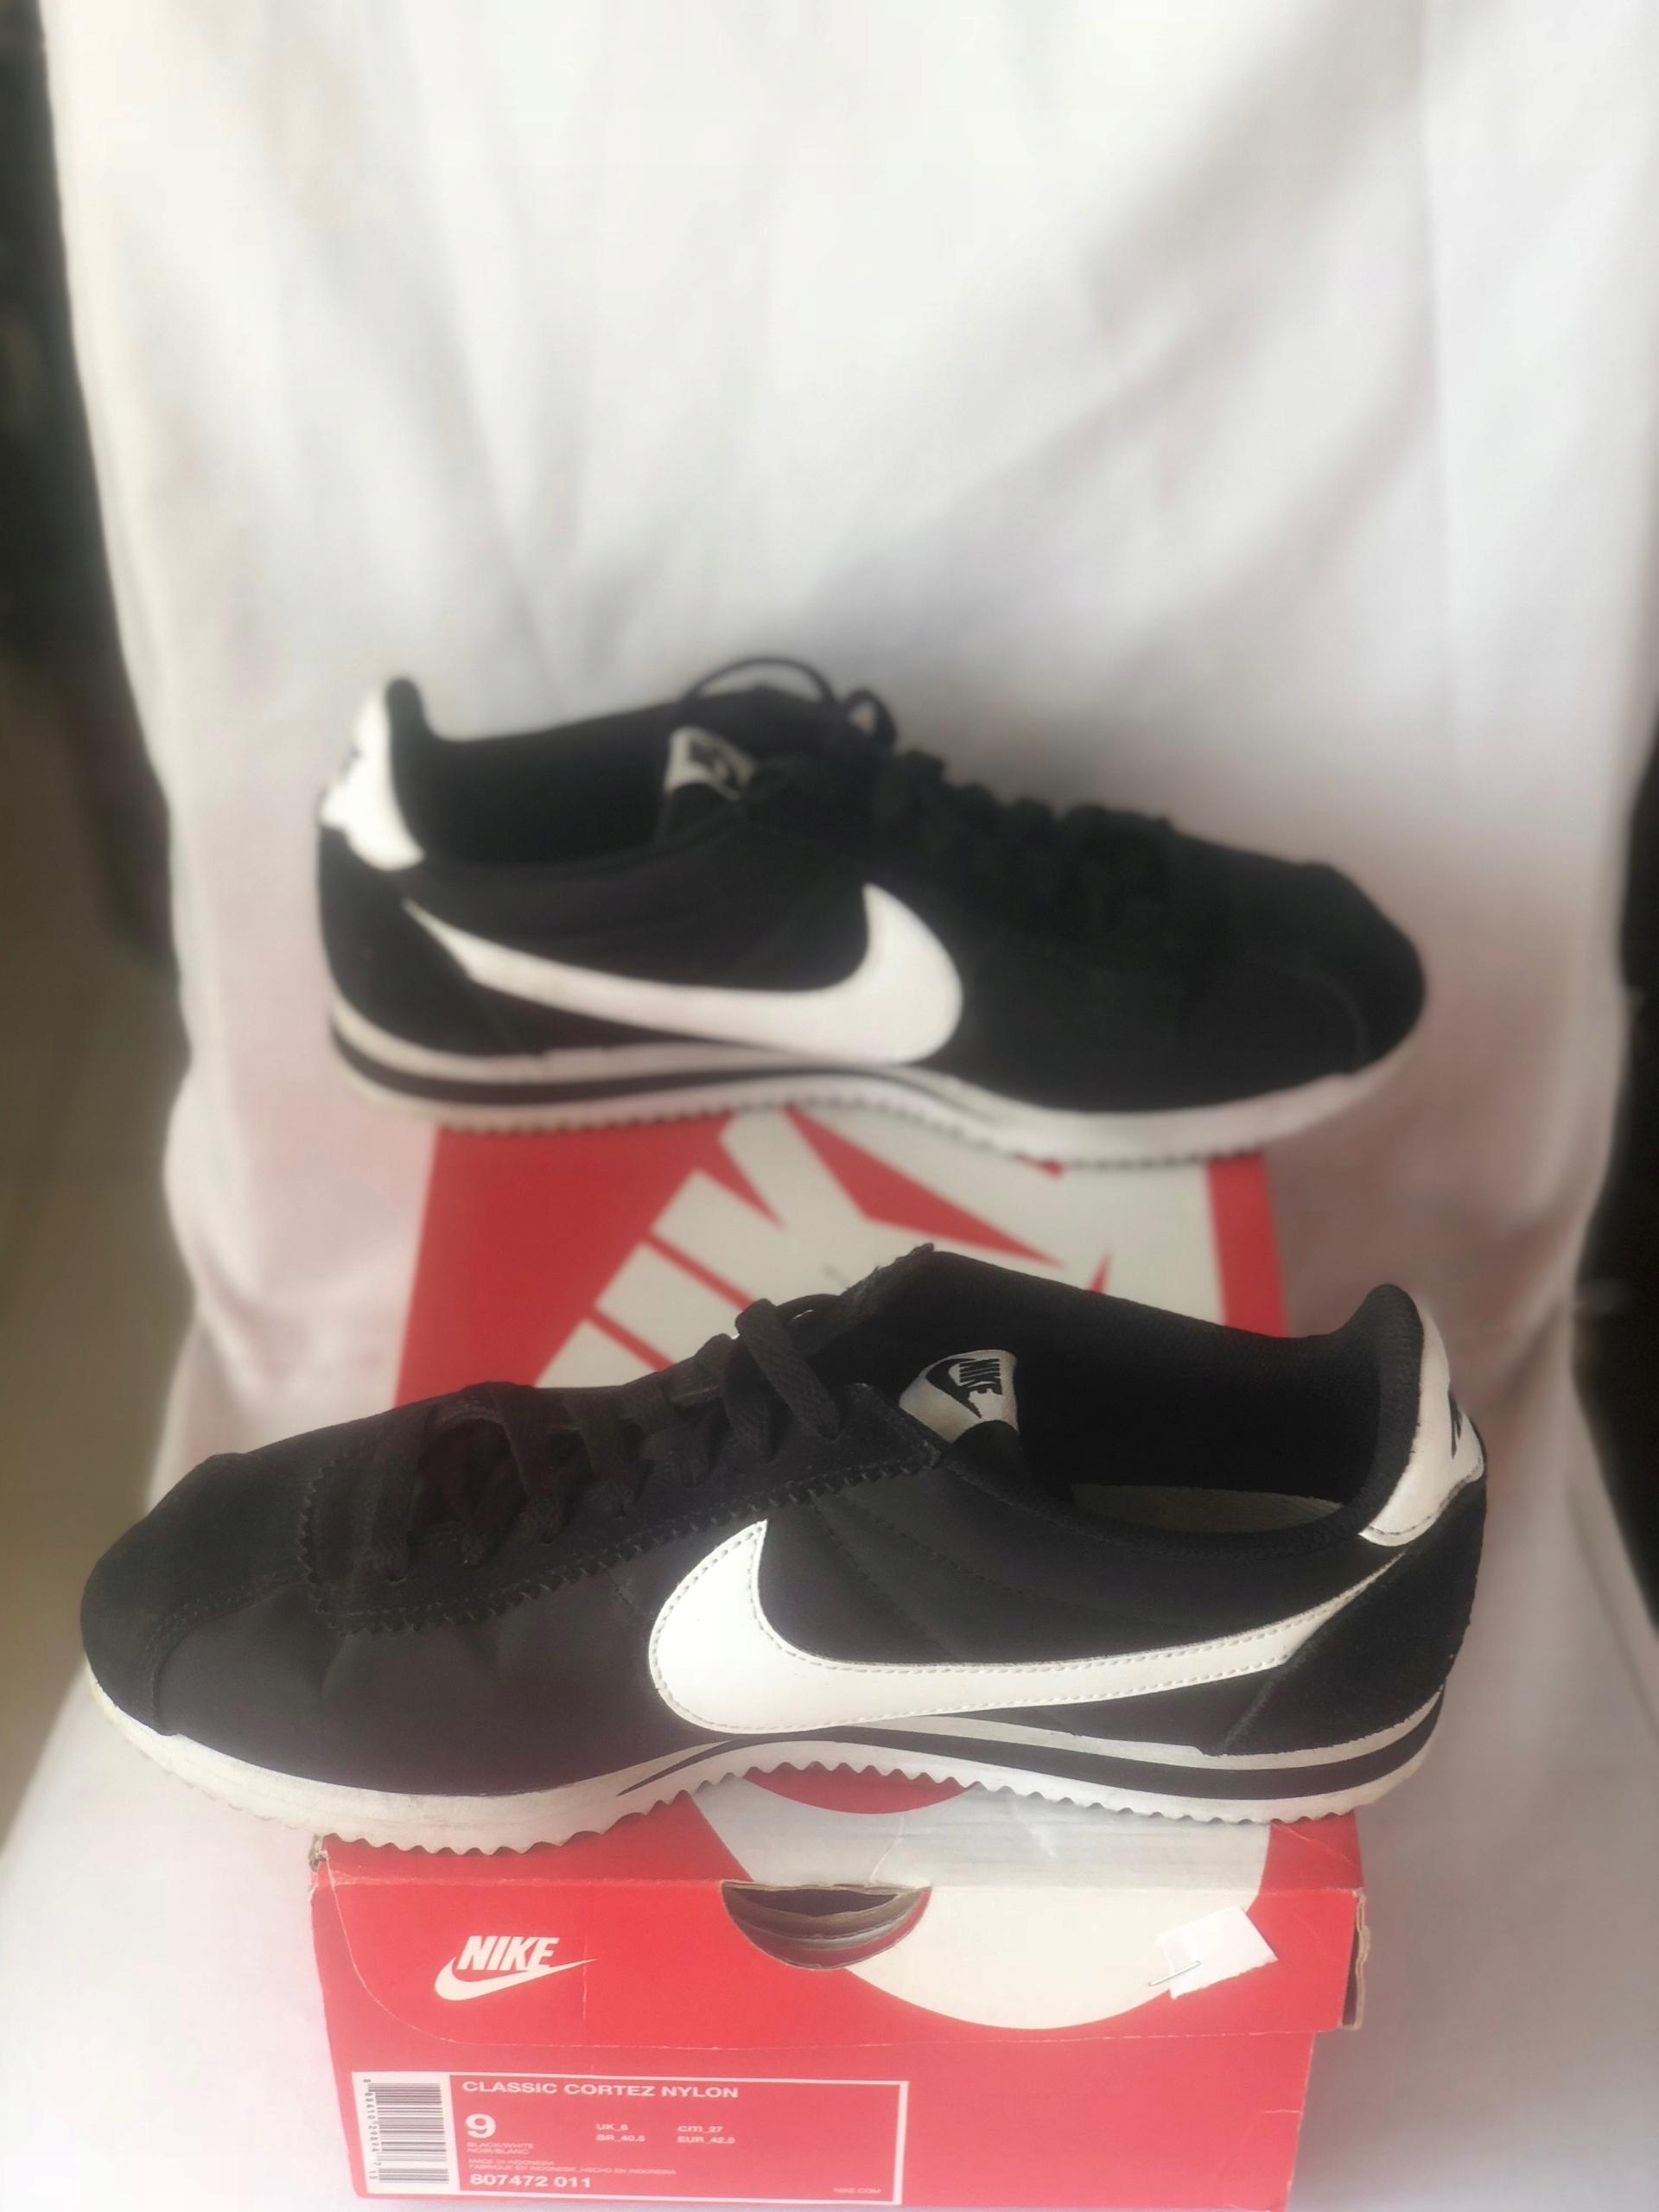 premium selection e93a0 8e50a Buty Nike Classic Cortez Nylon r. 42,5 UŻYWANE